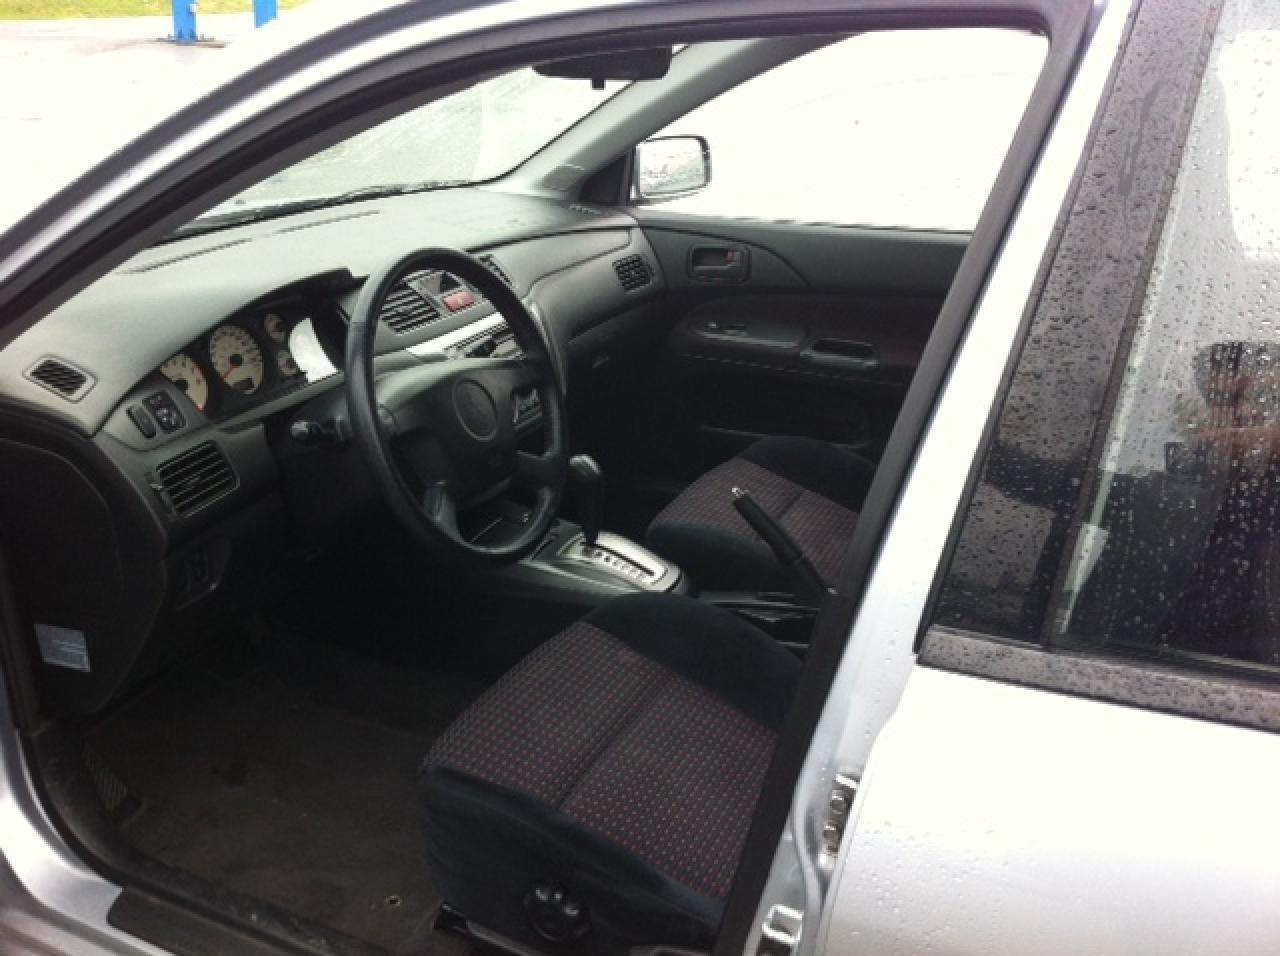 2004 Mitsubishi Lancer Sportback Ralliart edtion